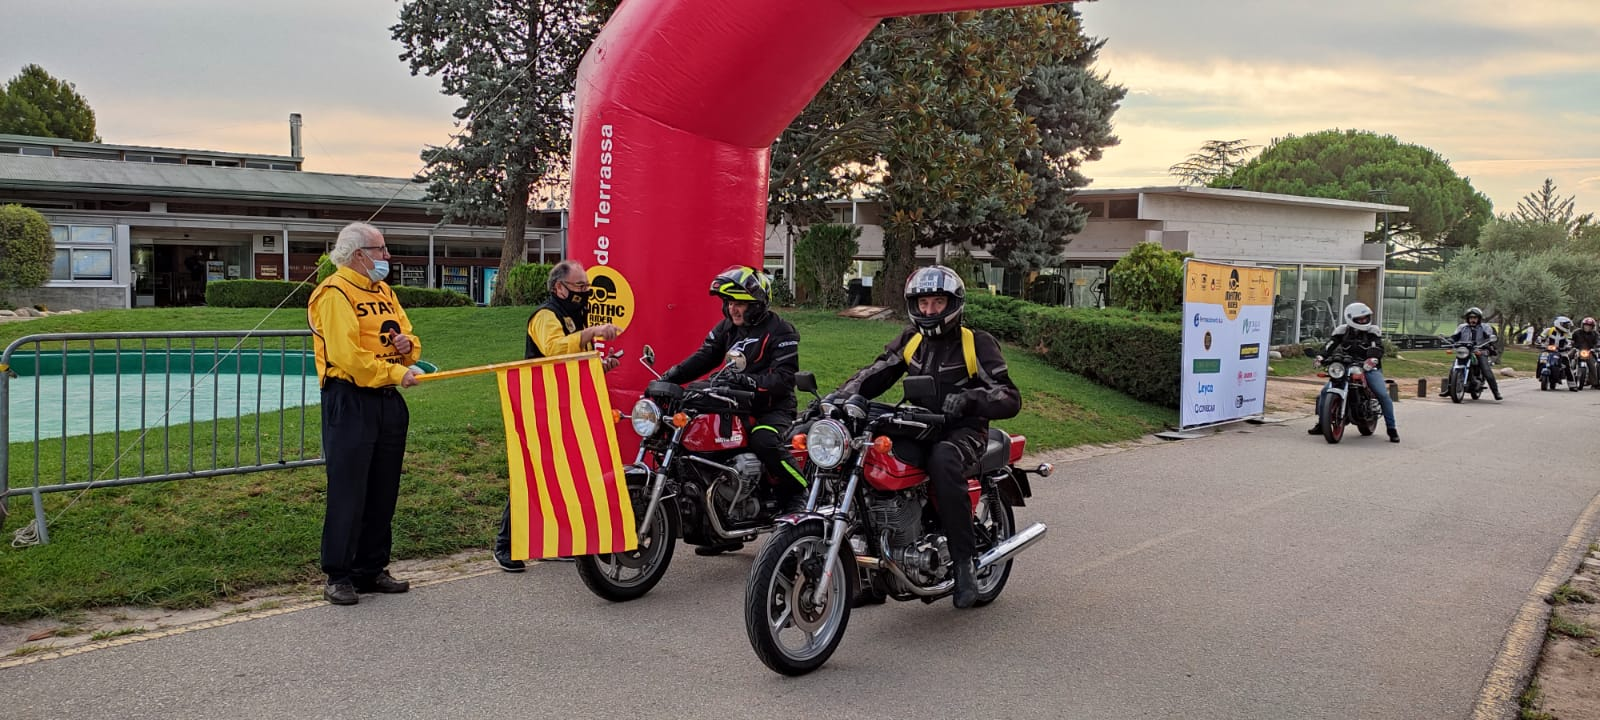 Les motocicletes participants en la primera MATHC Rider | ATHC